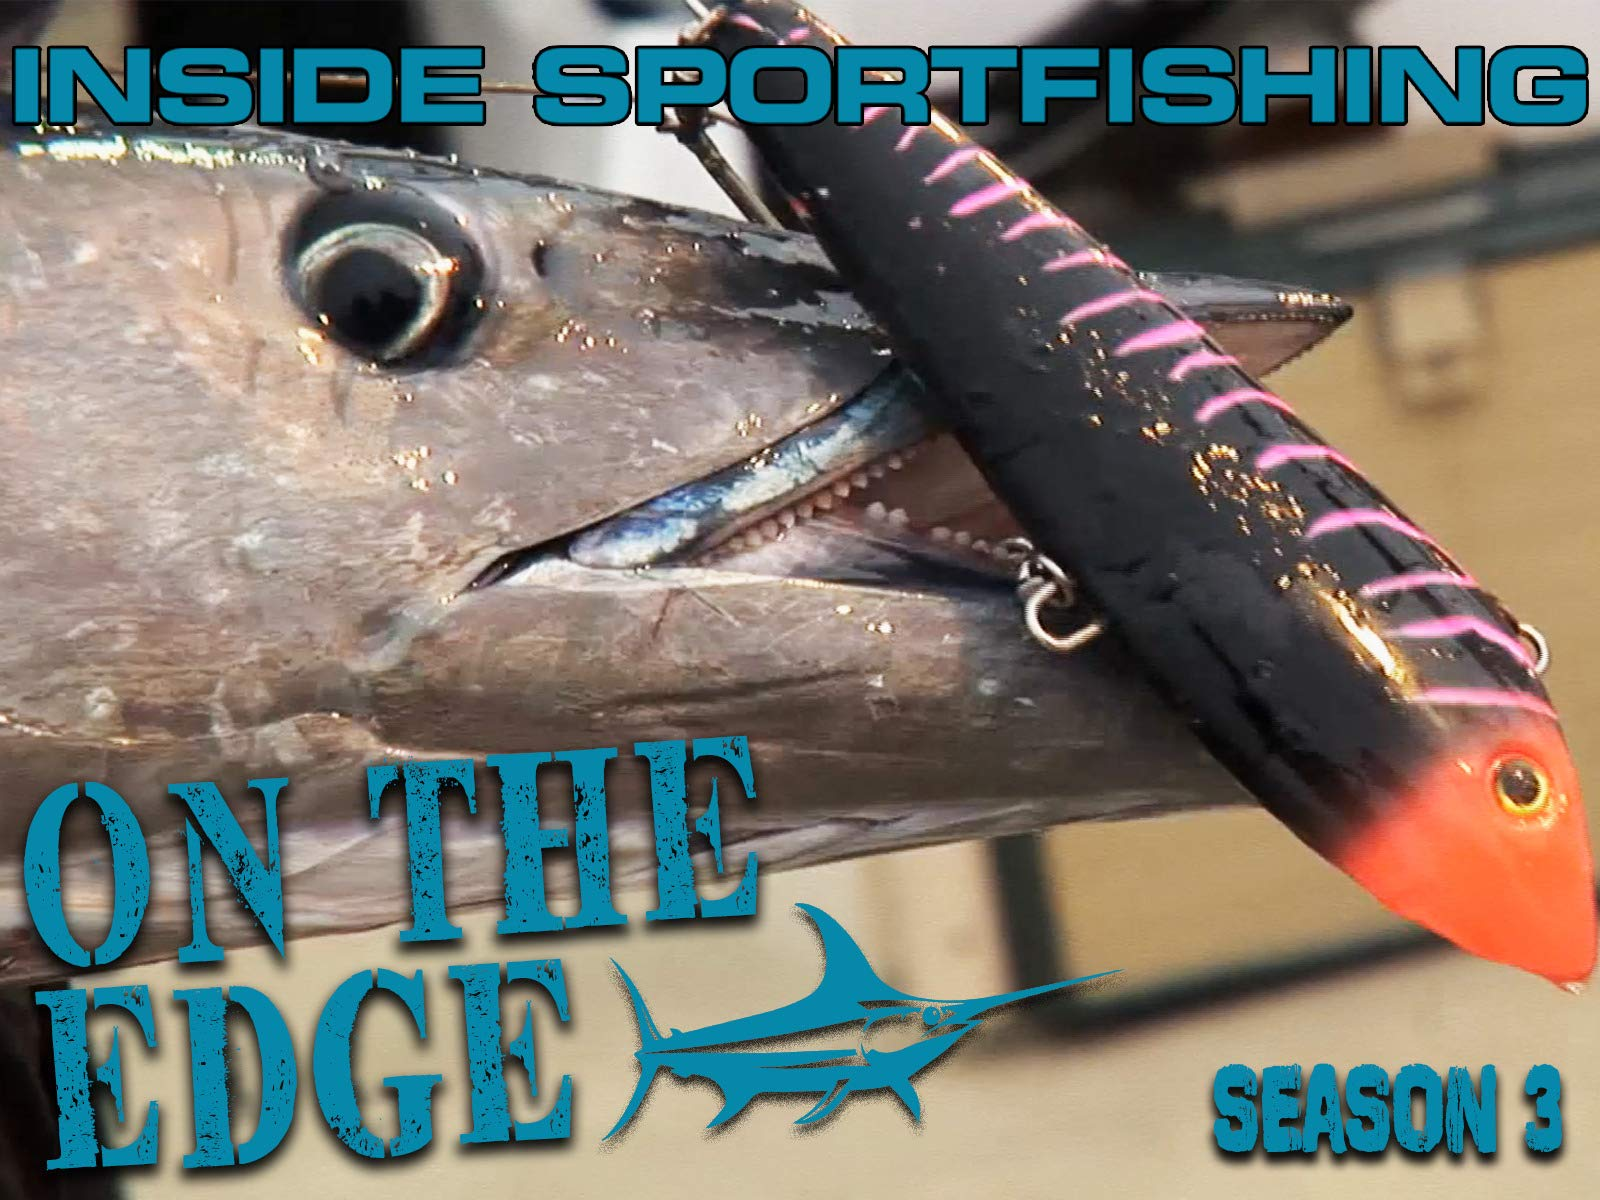 Clip: Inside Sportfishing- On The Edge - Season 3